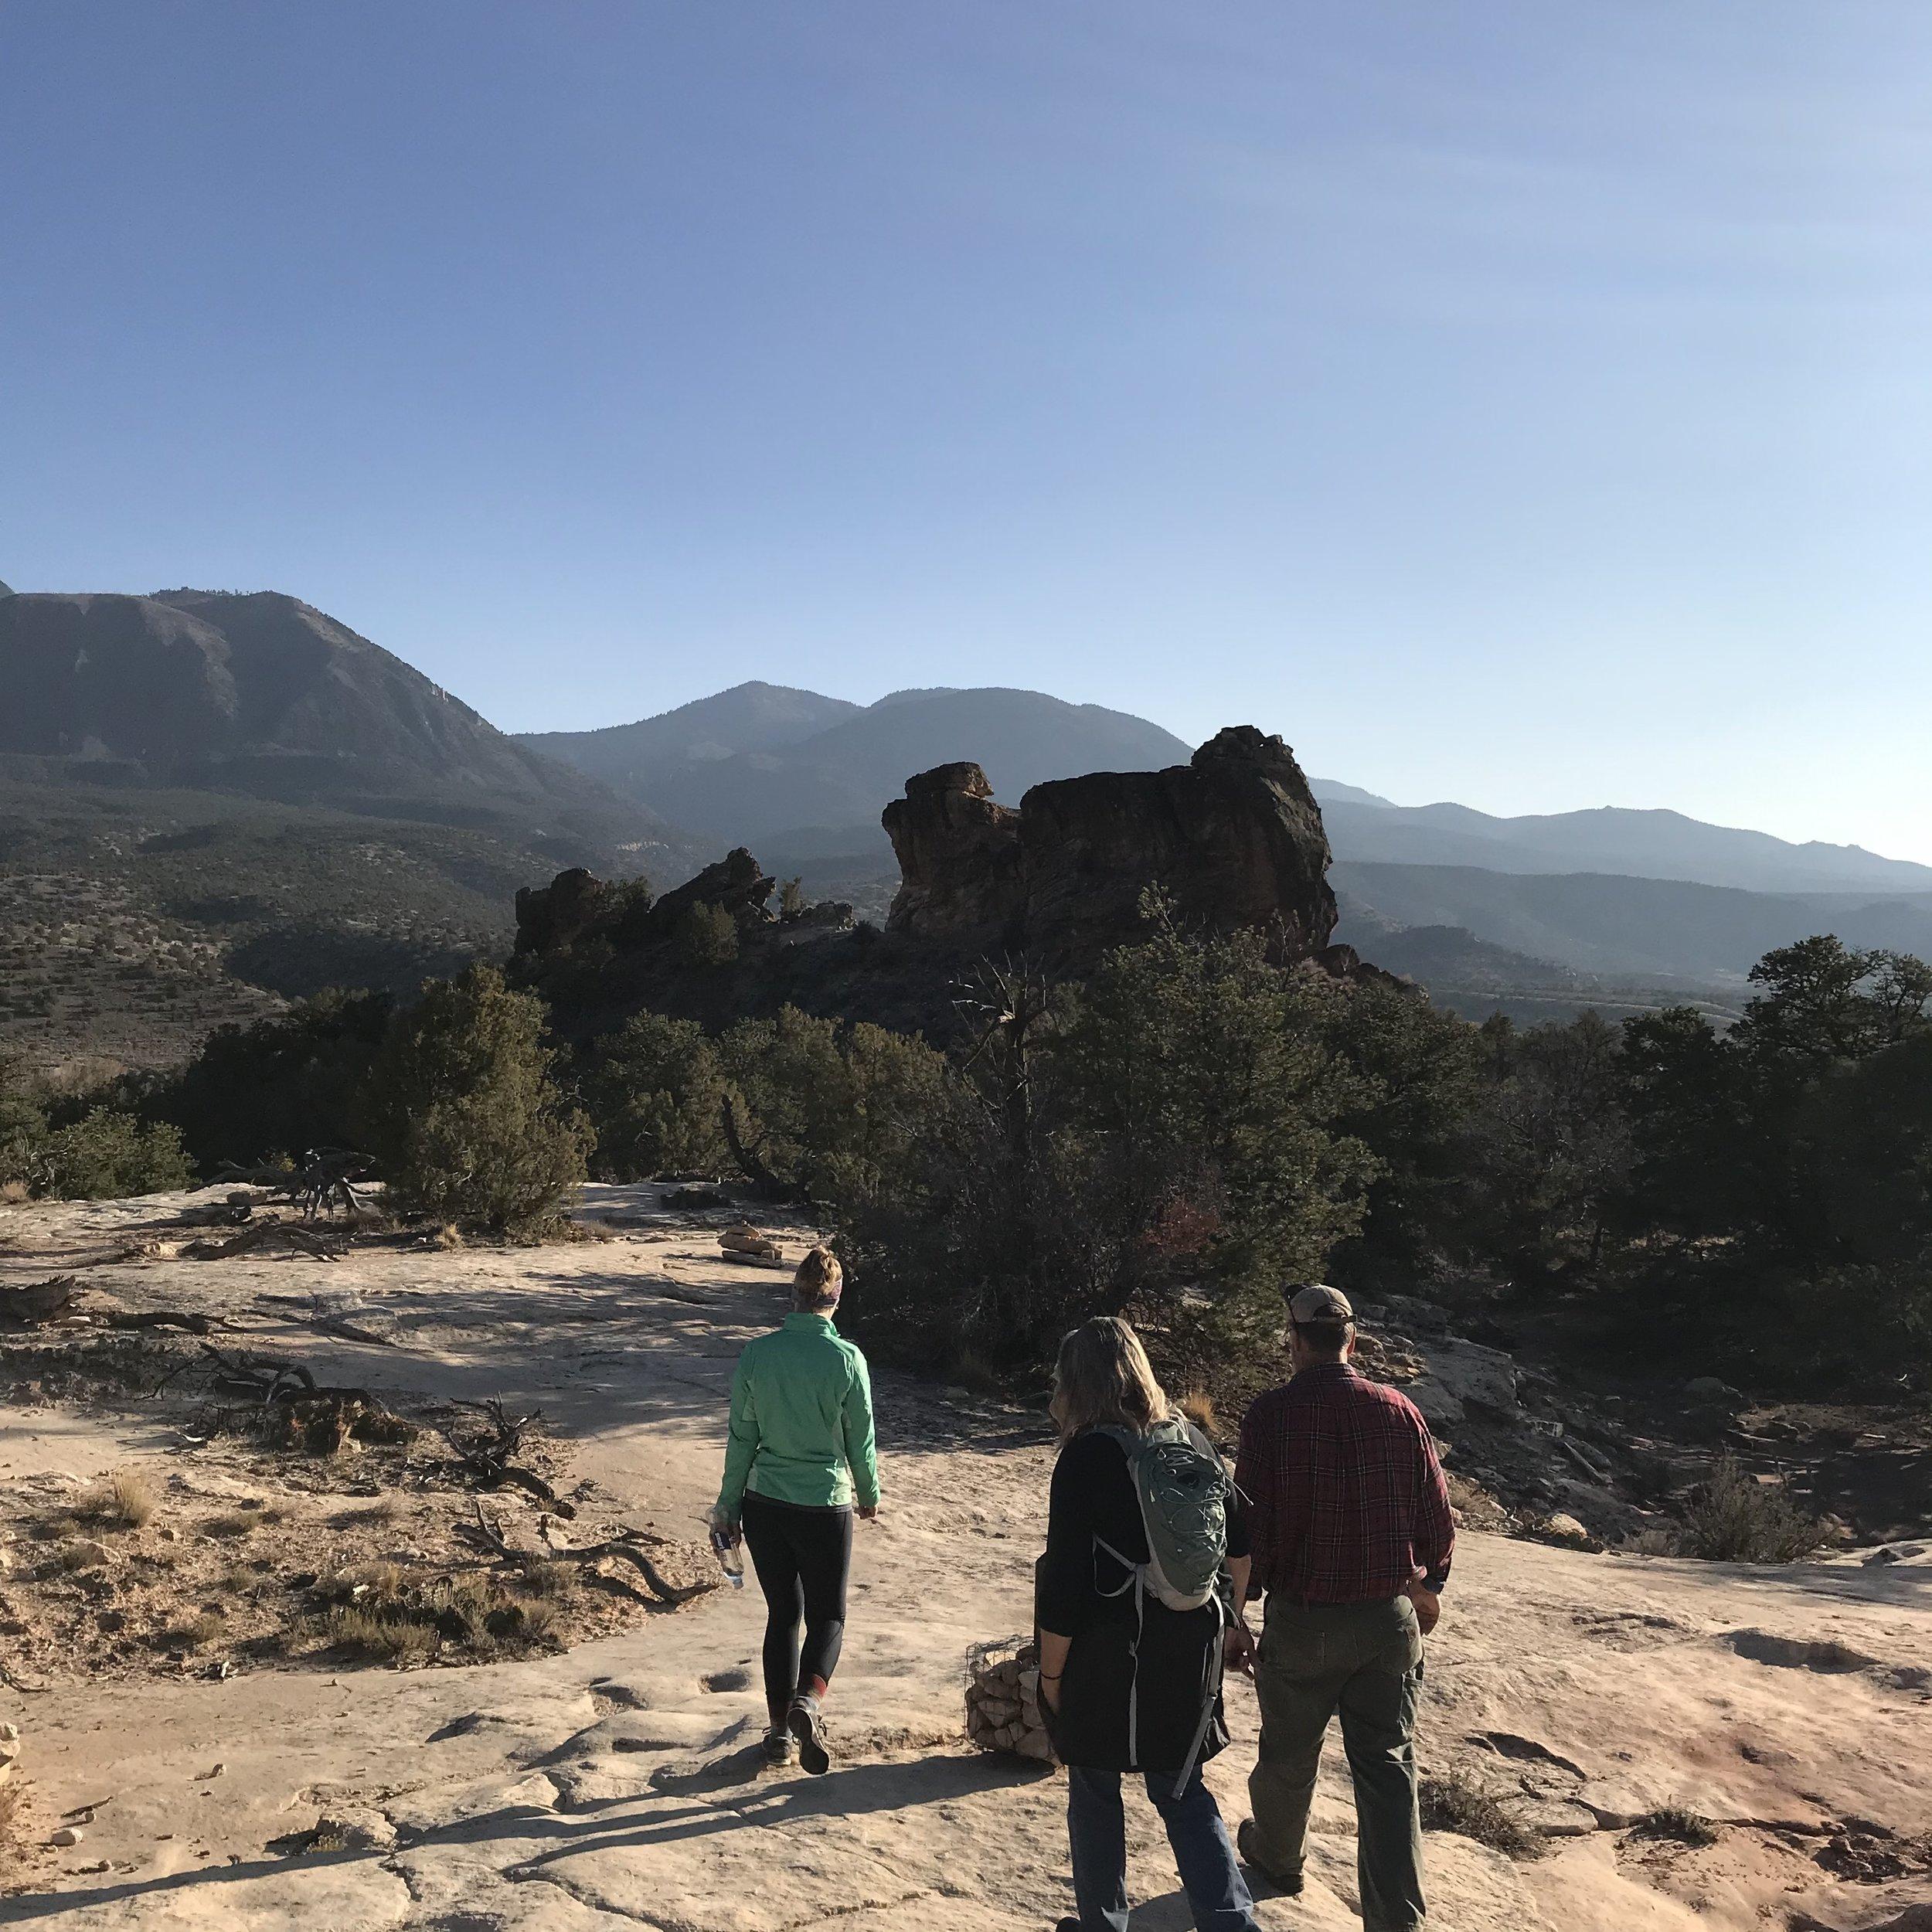 Hiking at Sand Canyon Trailhead